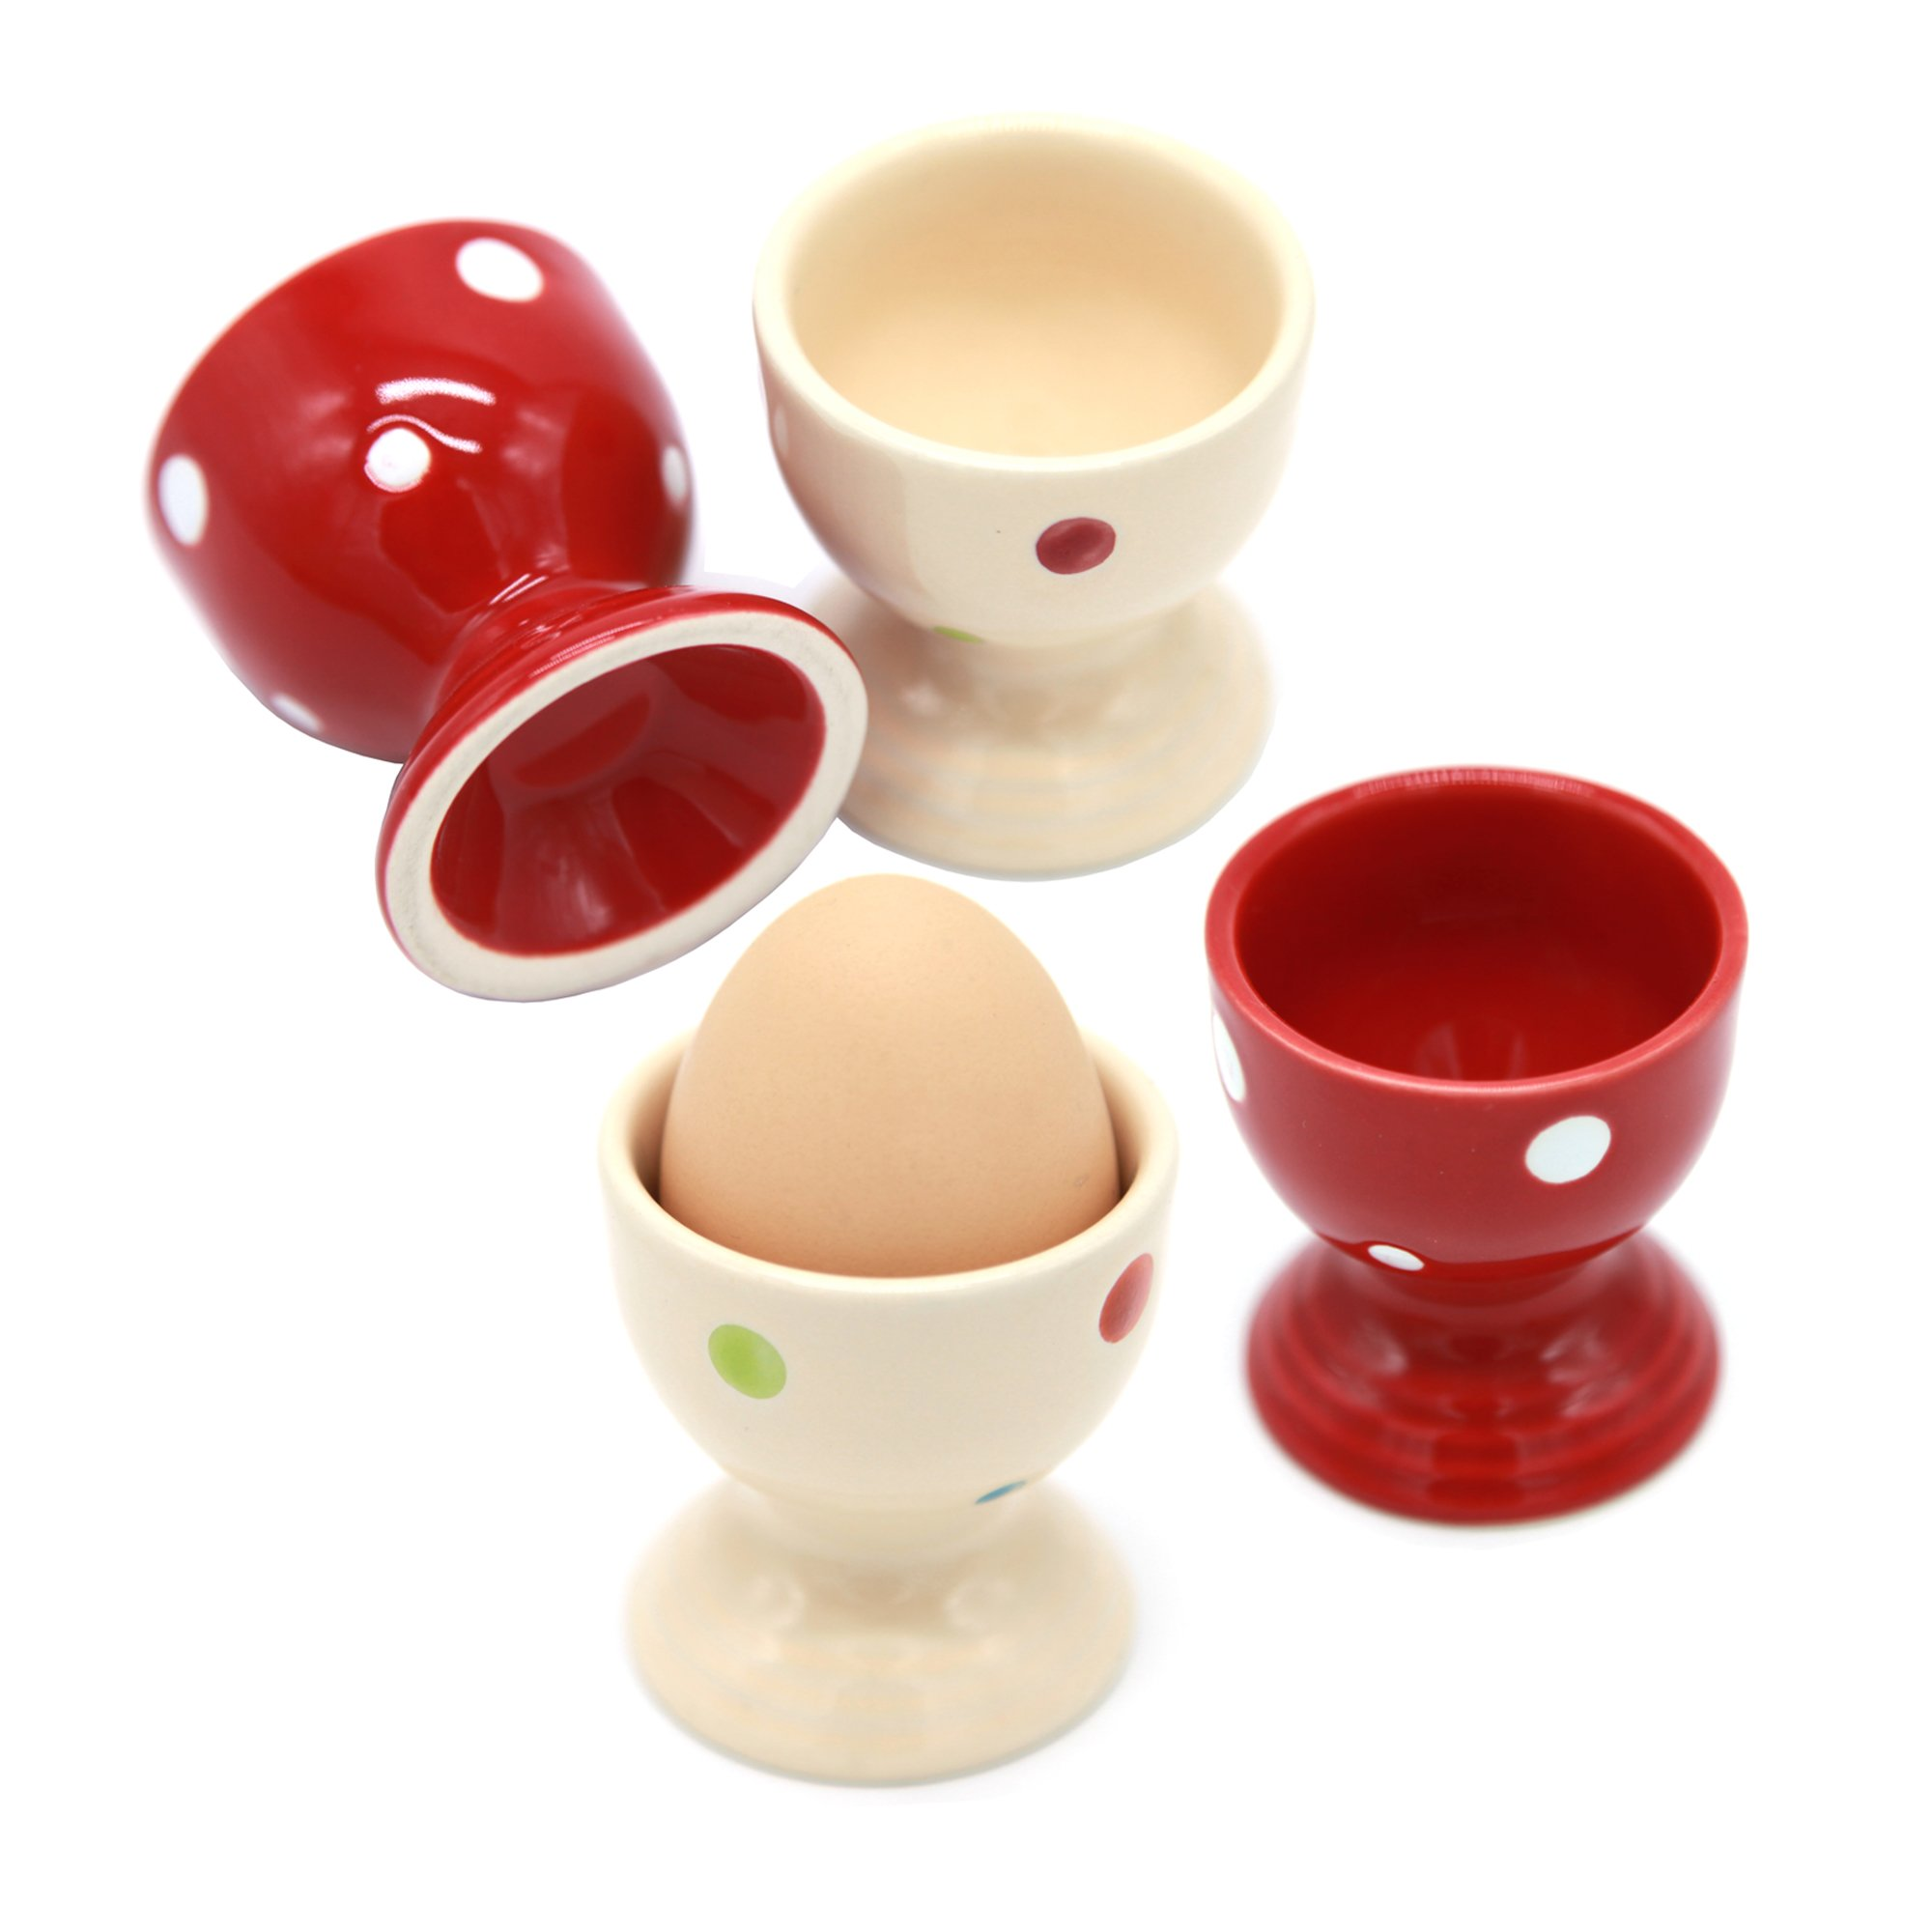 Passionier Egg Cups, Set of Four Ceramic Polka Dot Egg Cups Porcelain Egg Holders - Gifts for Kitchen